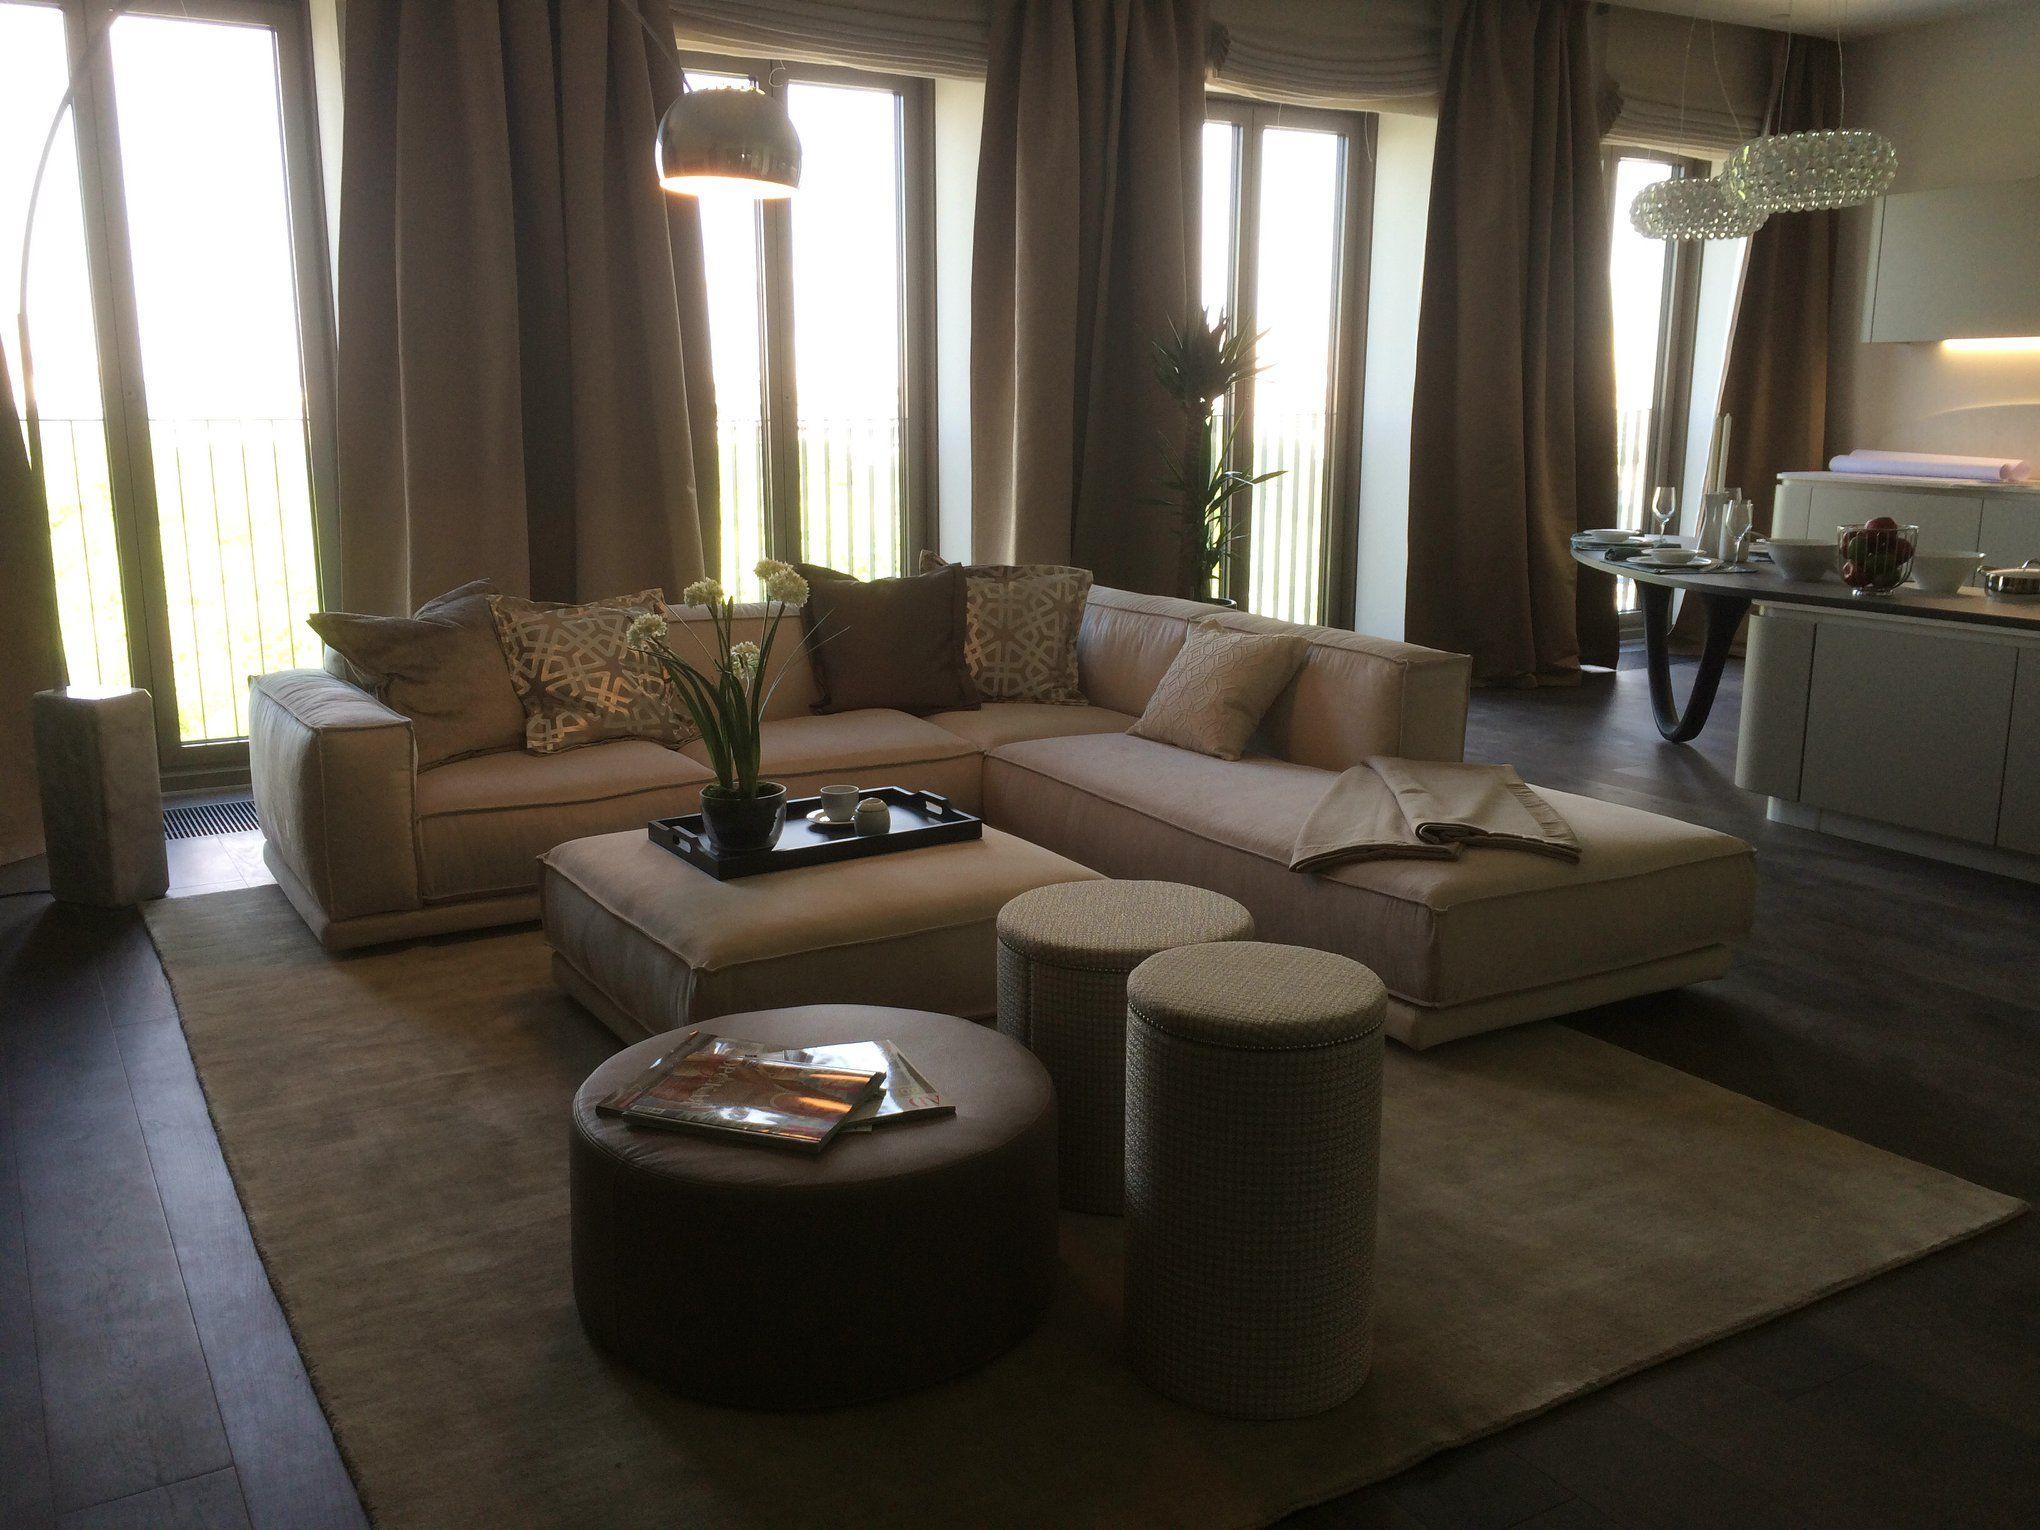 CASAMILANO Private villa featuring some pieces of